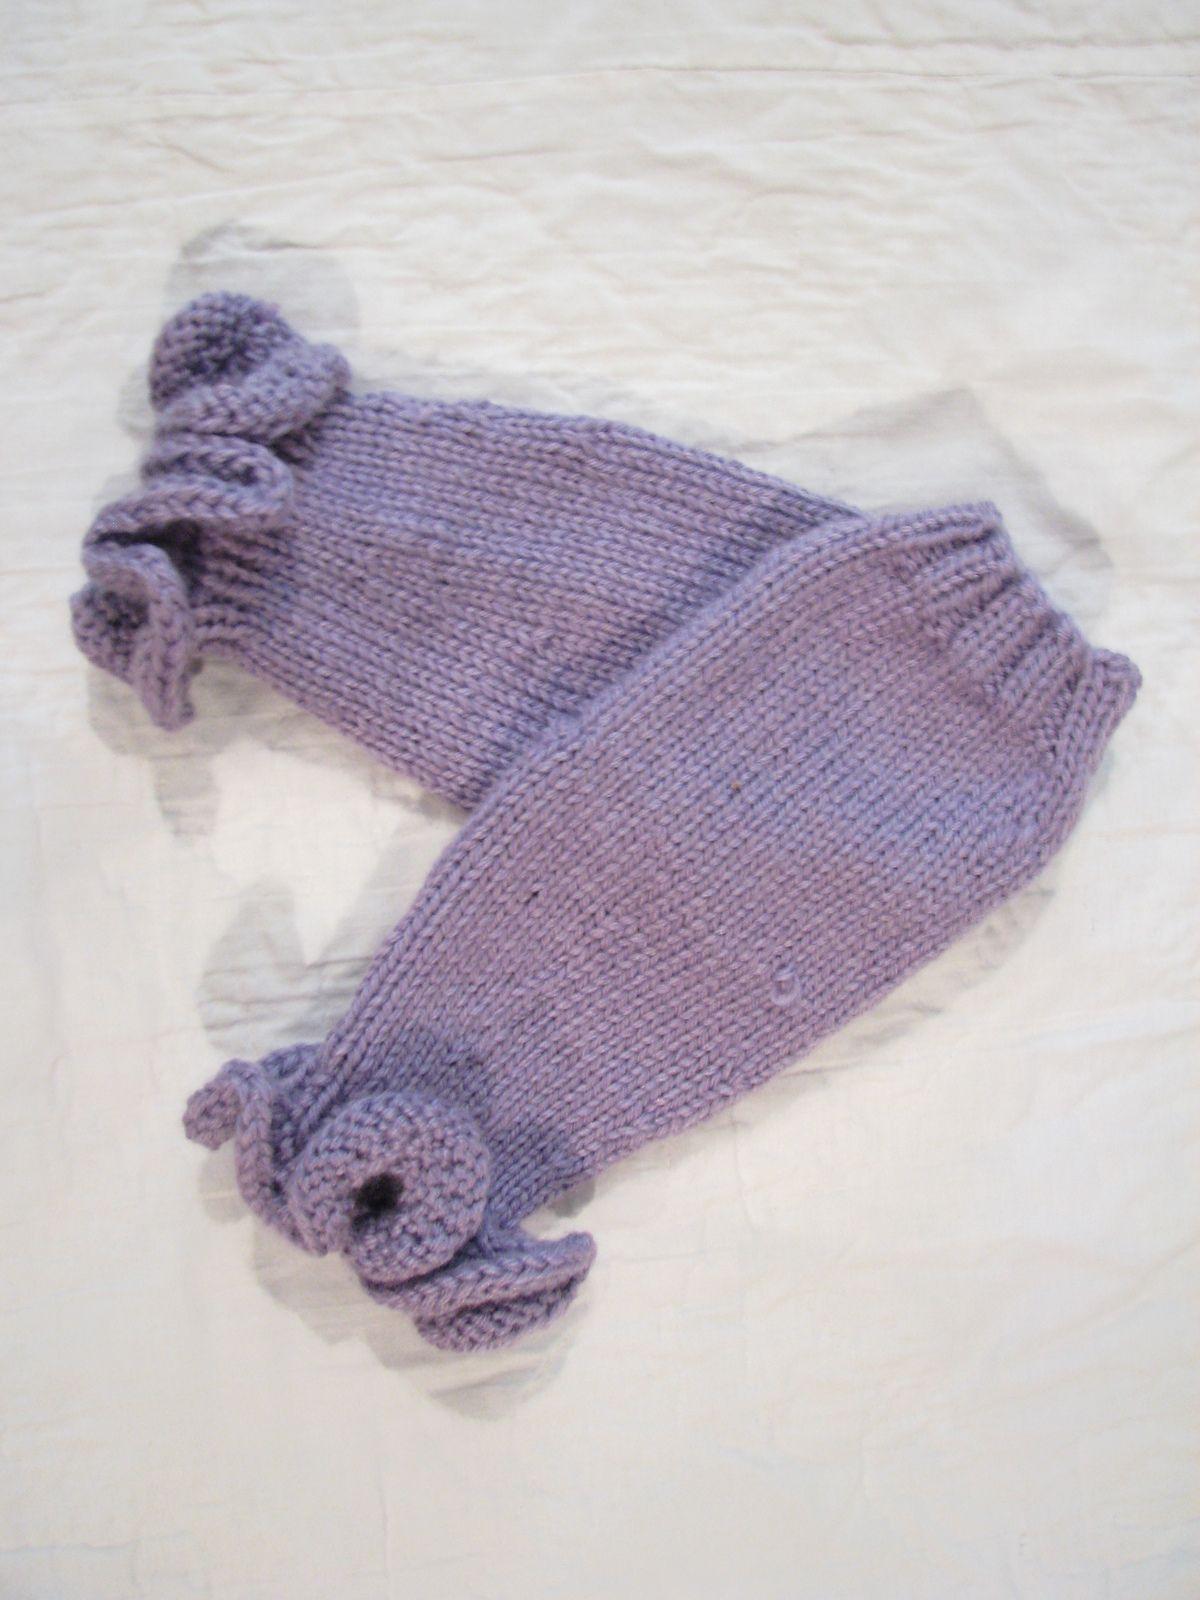 Ravelry: Ruffled Leg Warmers by Eileen Casey | knitting & crocheting ...